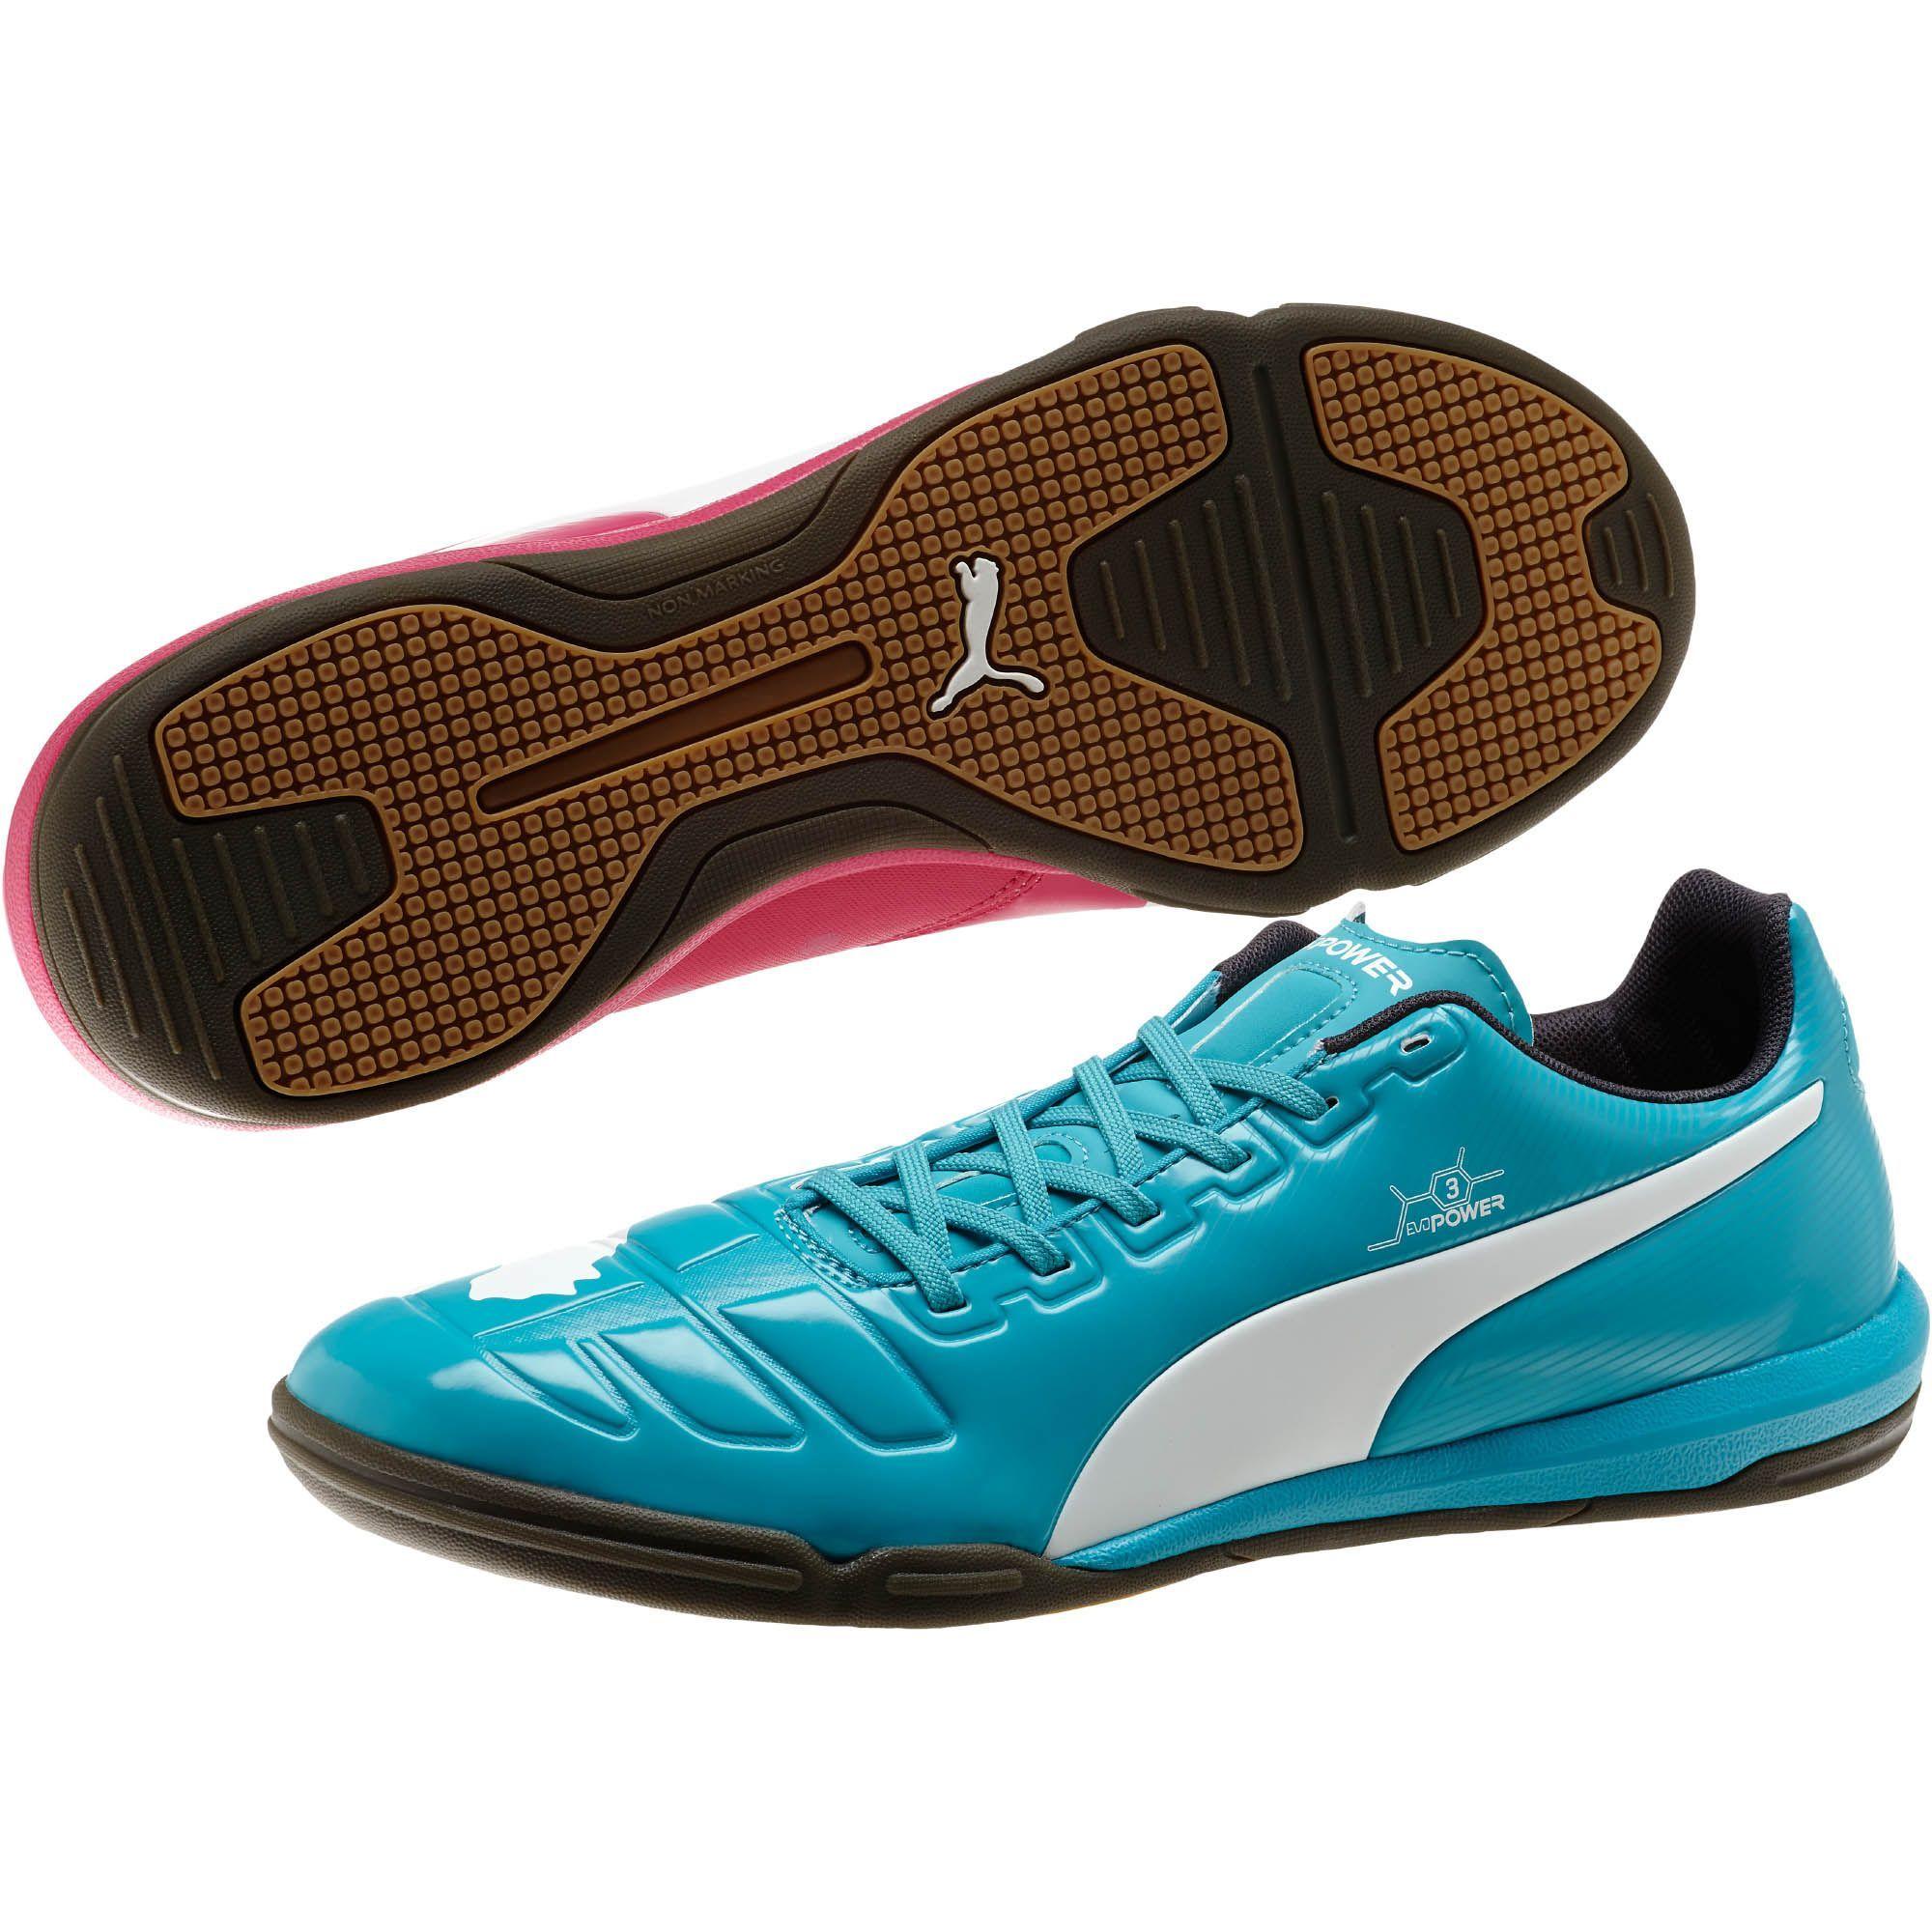 b690d82d853 PUMA evoPOWER 3 Tricks IT Men s Indoor Soccer Shoes